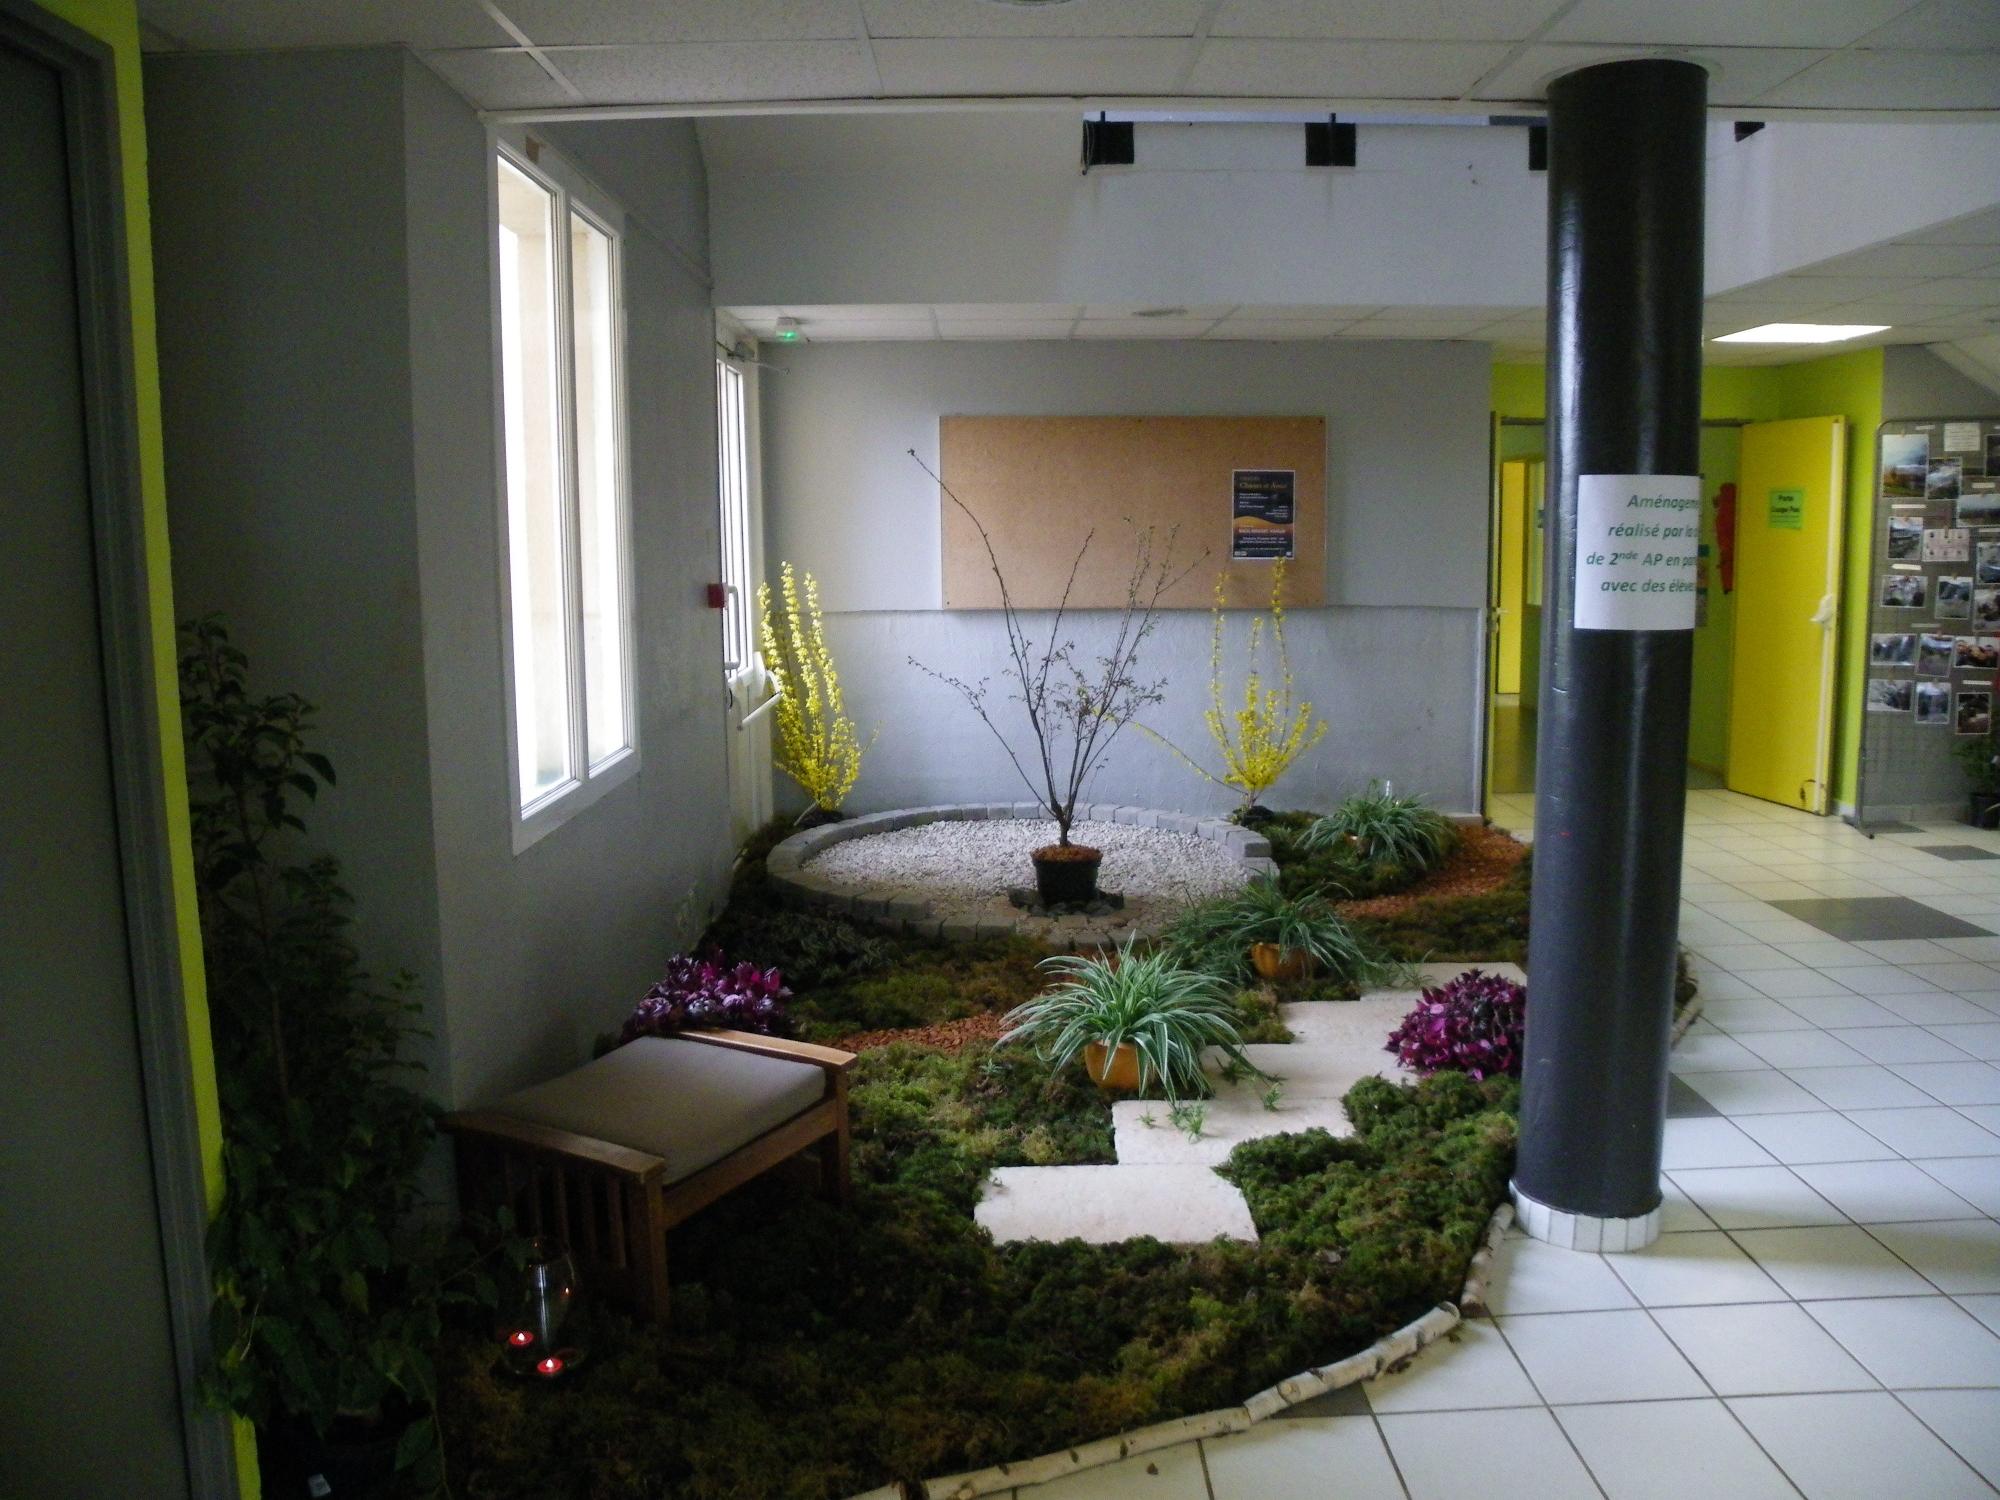 2019.03.09-Portes-ouvertes.03